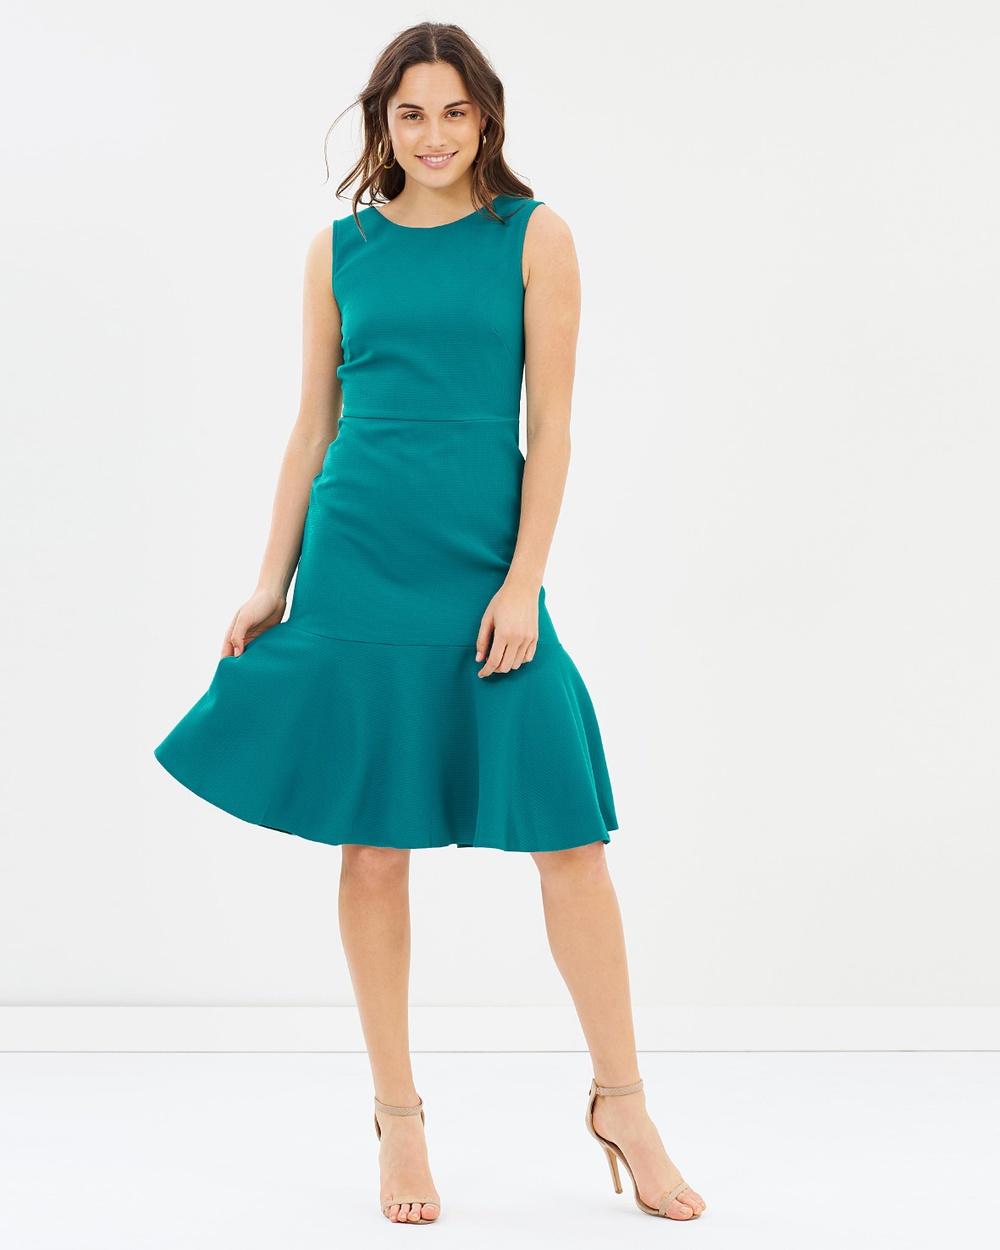 Closet London Sleeveless Peplum Dress Dresses Green Sleeveless Peplum Dress